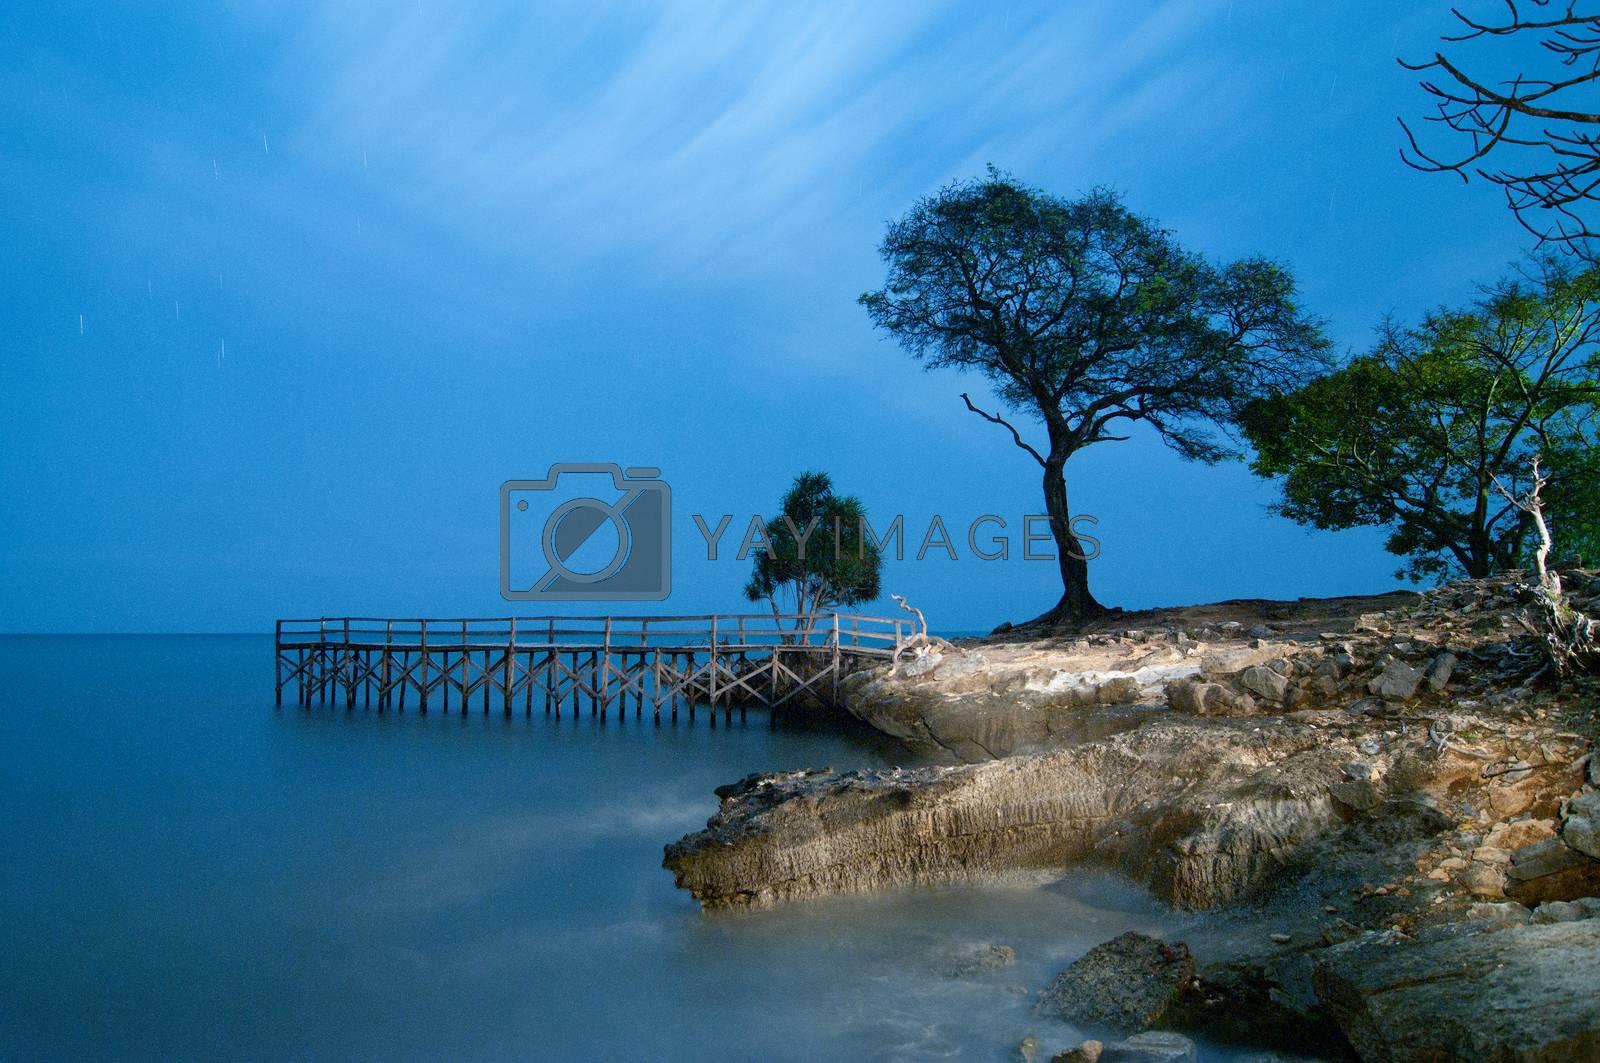 Topejawa beach at Takalar Indonesia by antonihalim